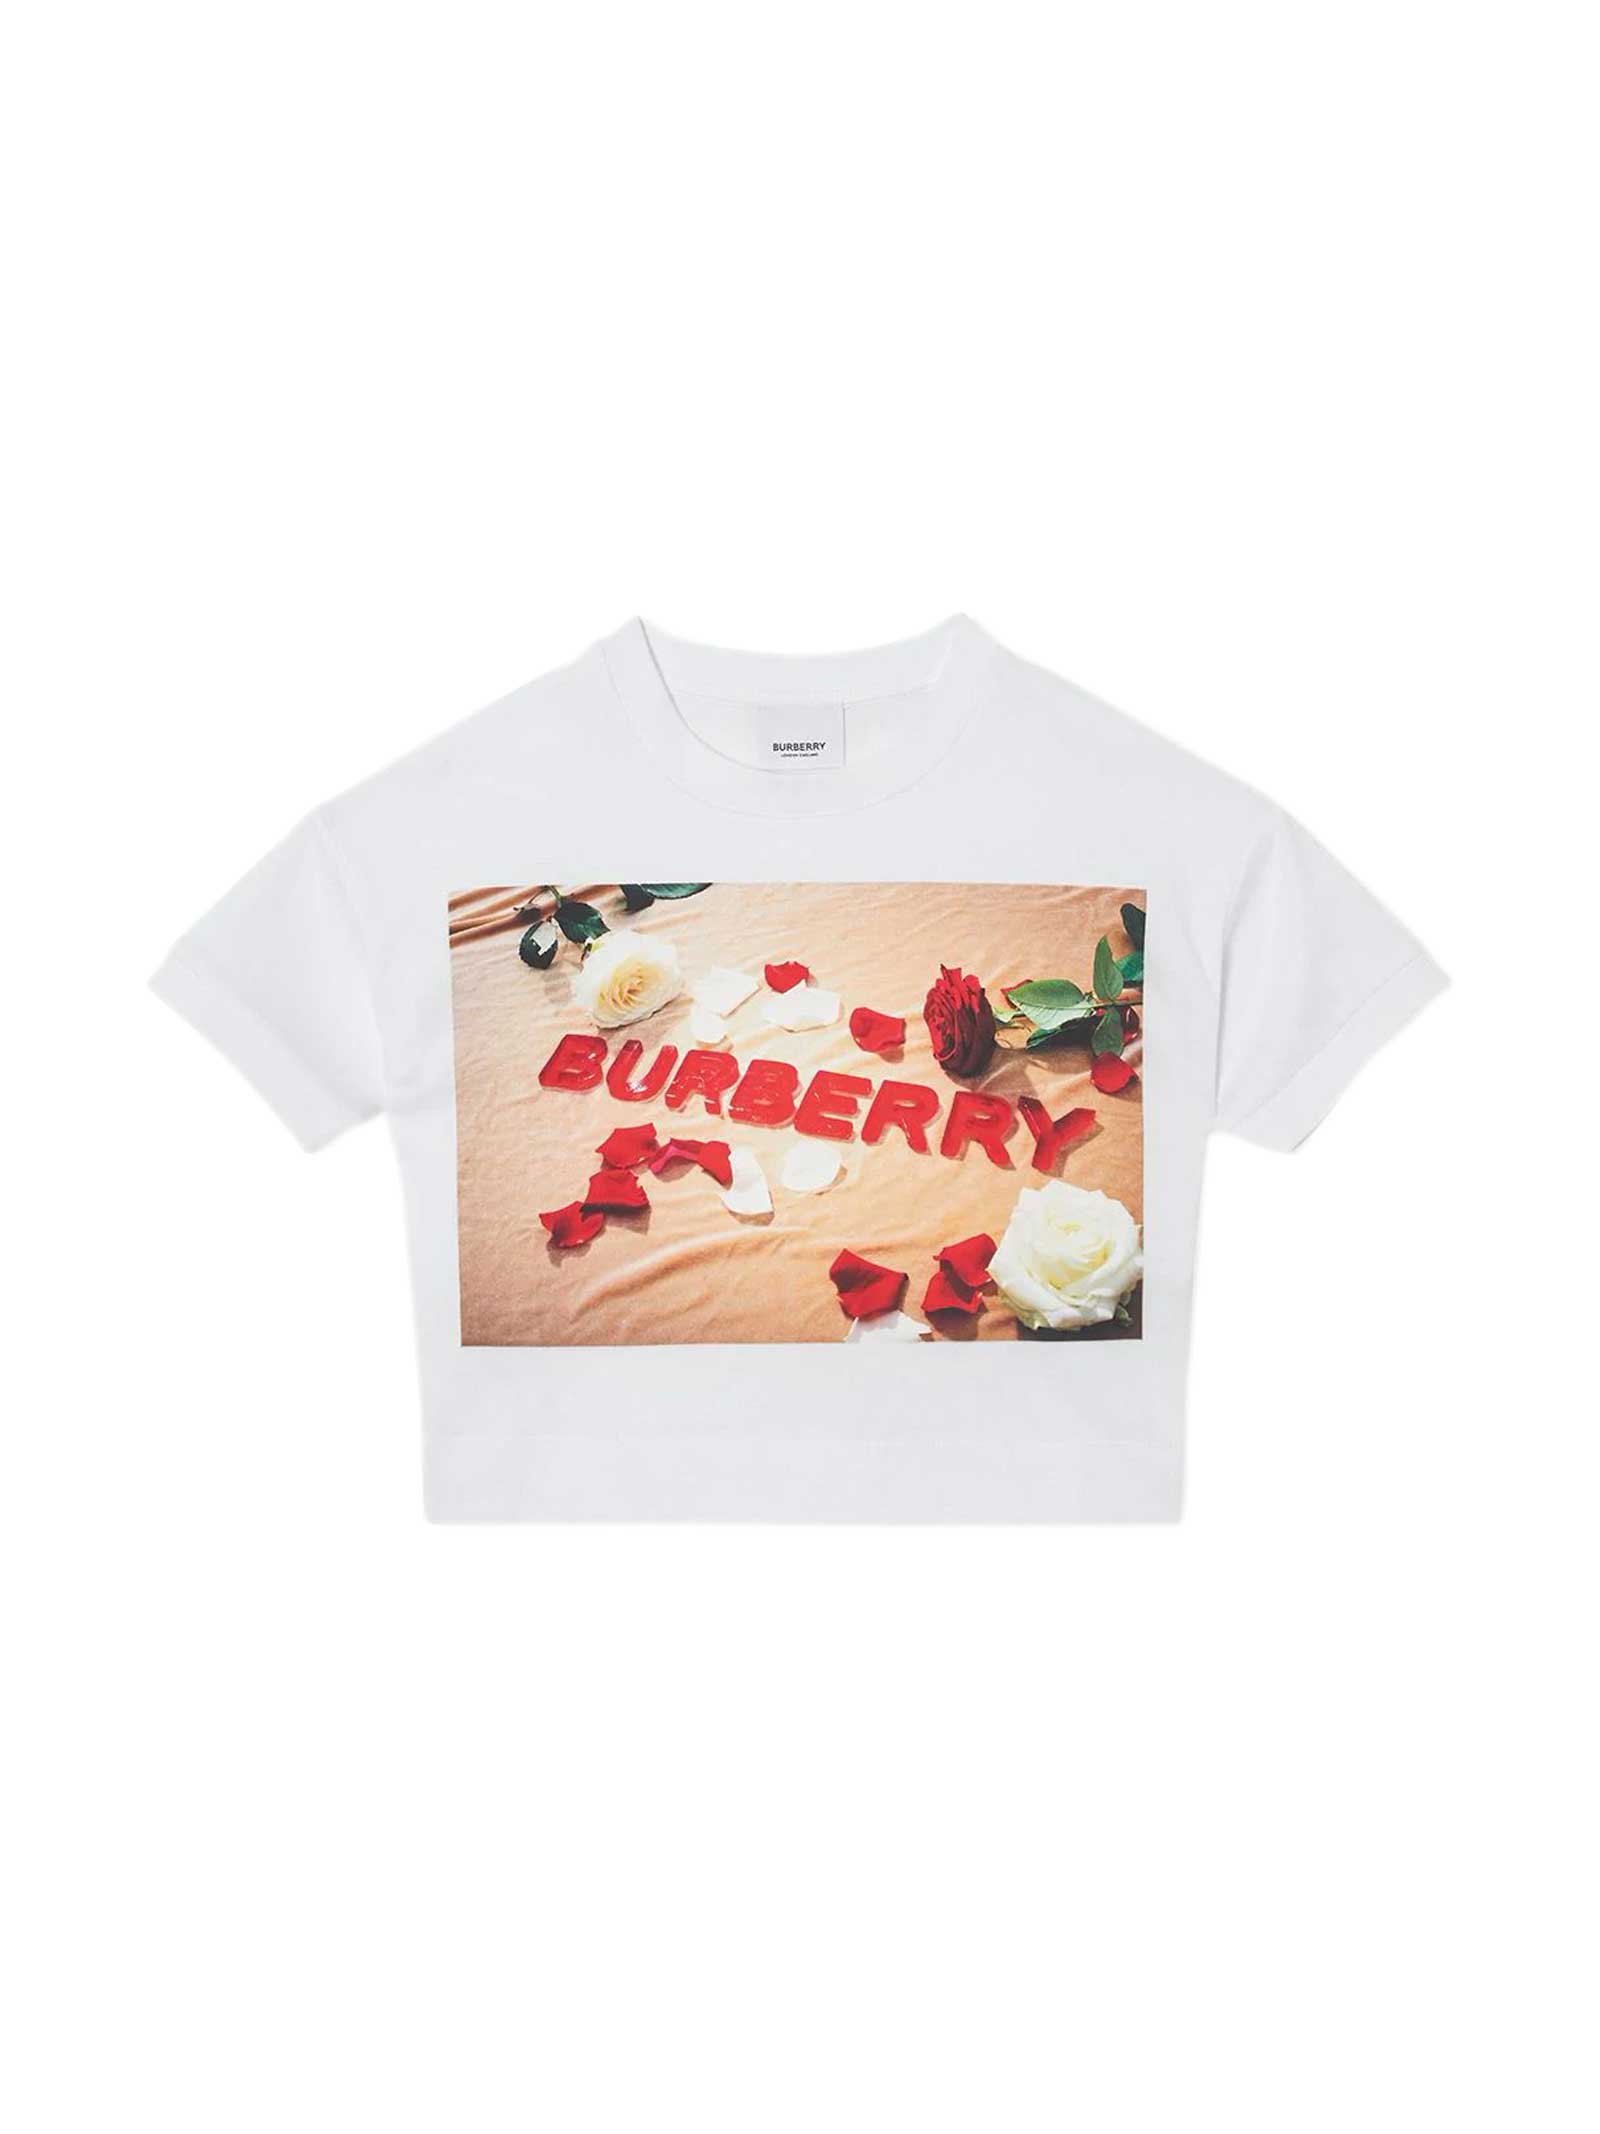 Burberry Kids' White T-shirt In Bianco